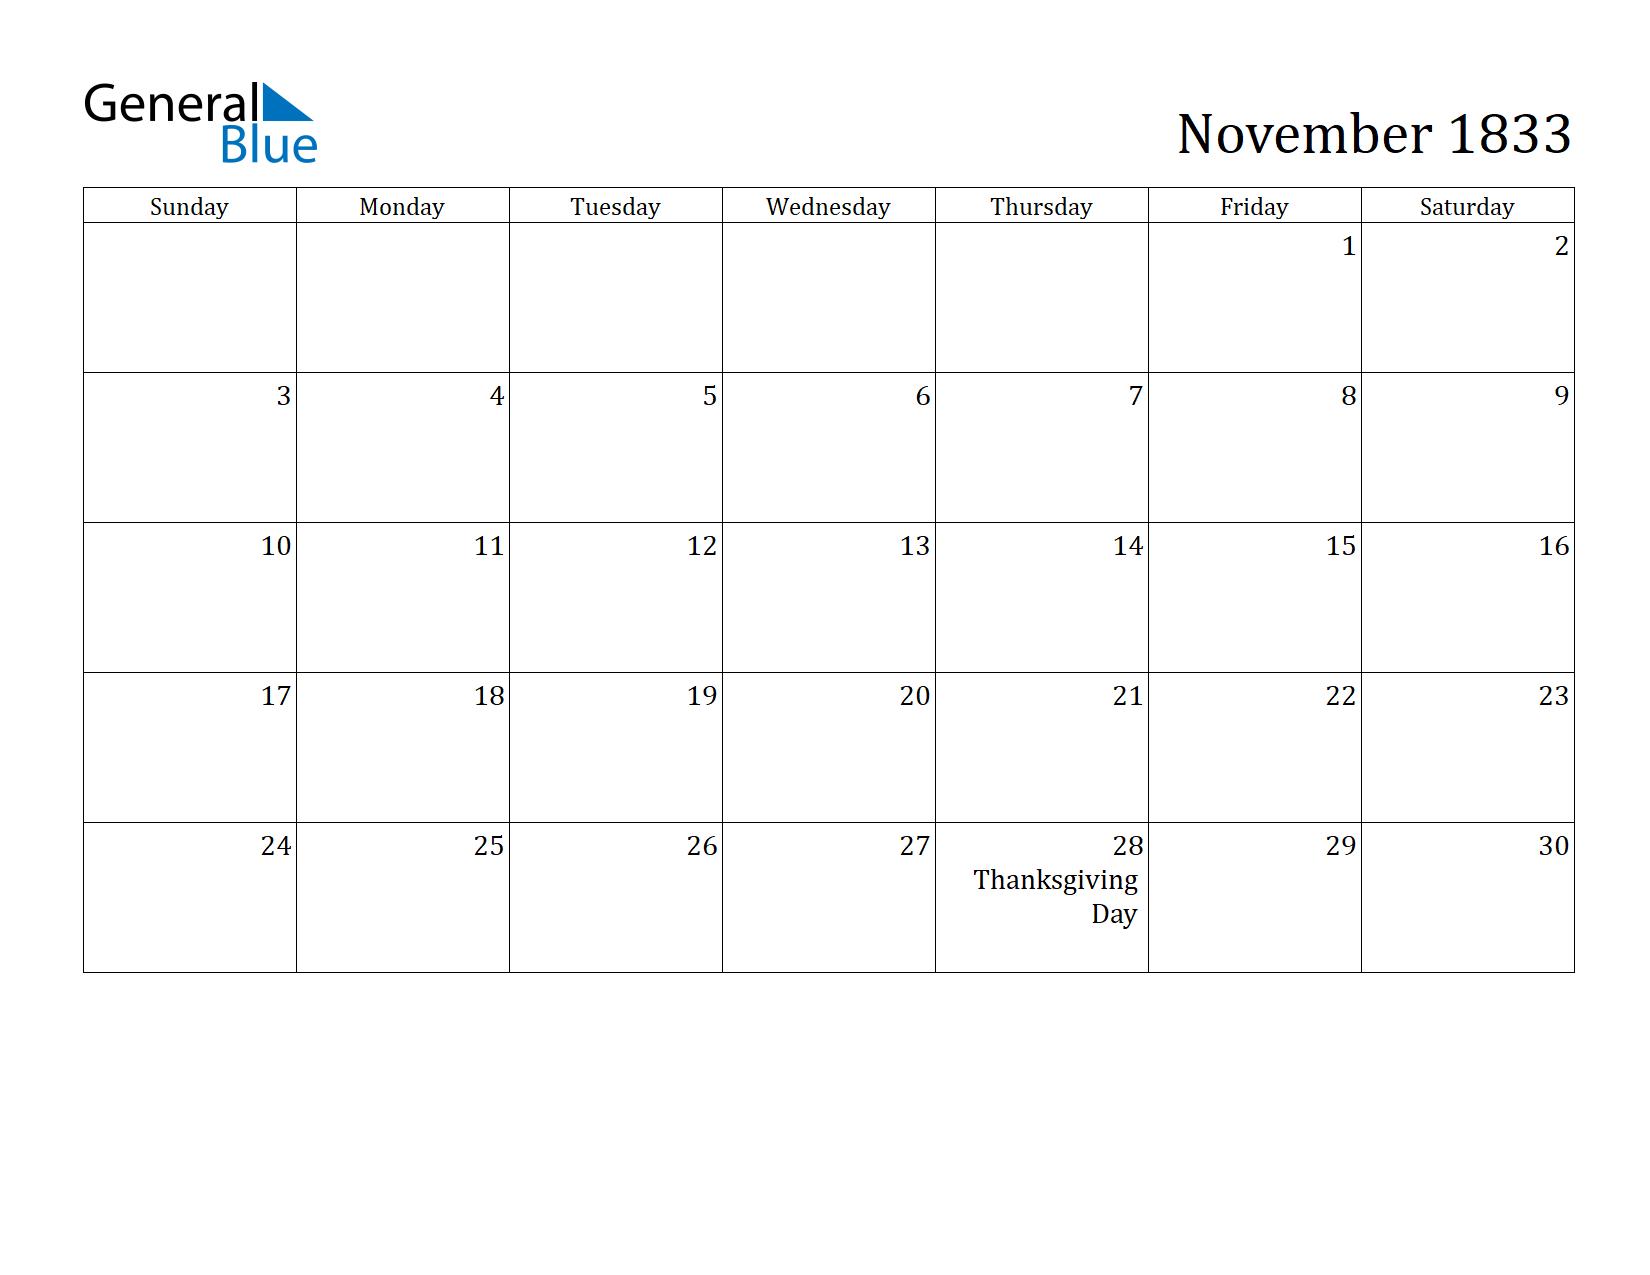 Image of November 1833 Calendar